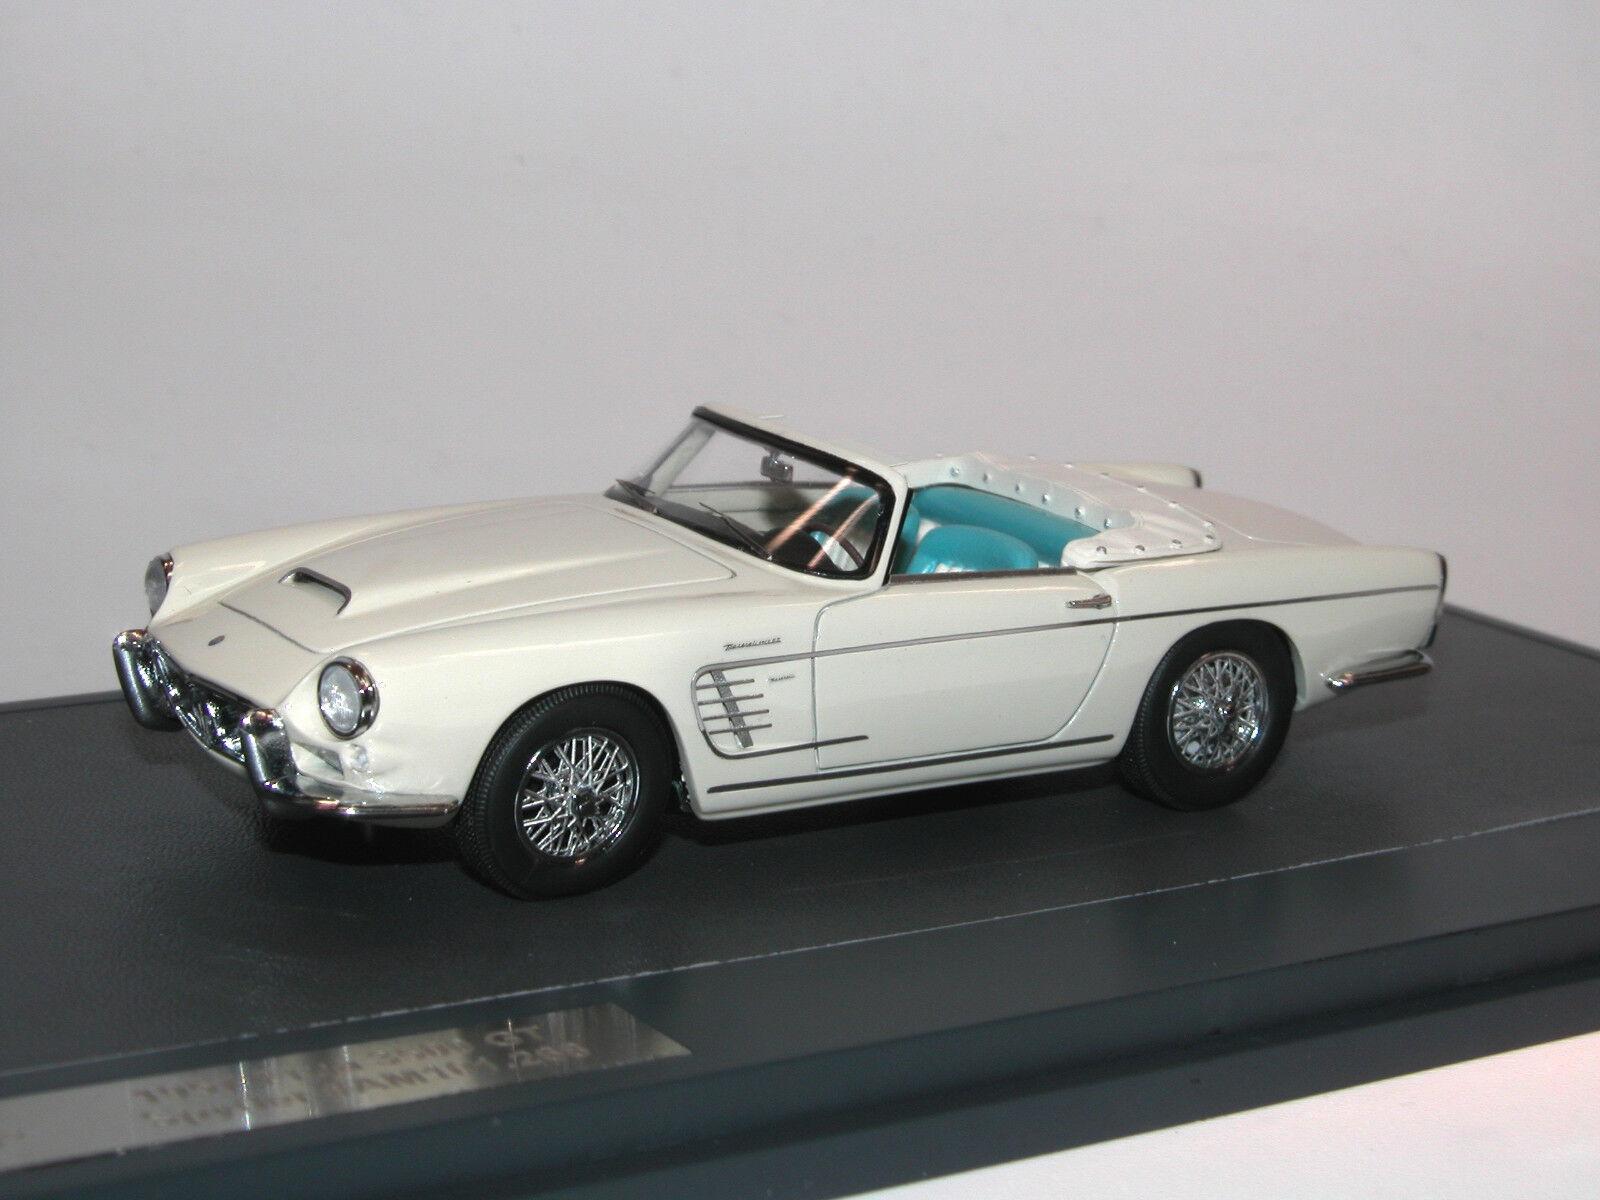 Matrix scale models 1957 Maserati 3500 GT Spyder by Frua  am101.268 bianca 1 43